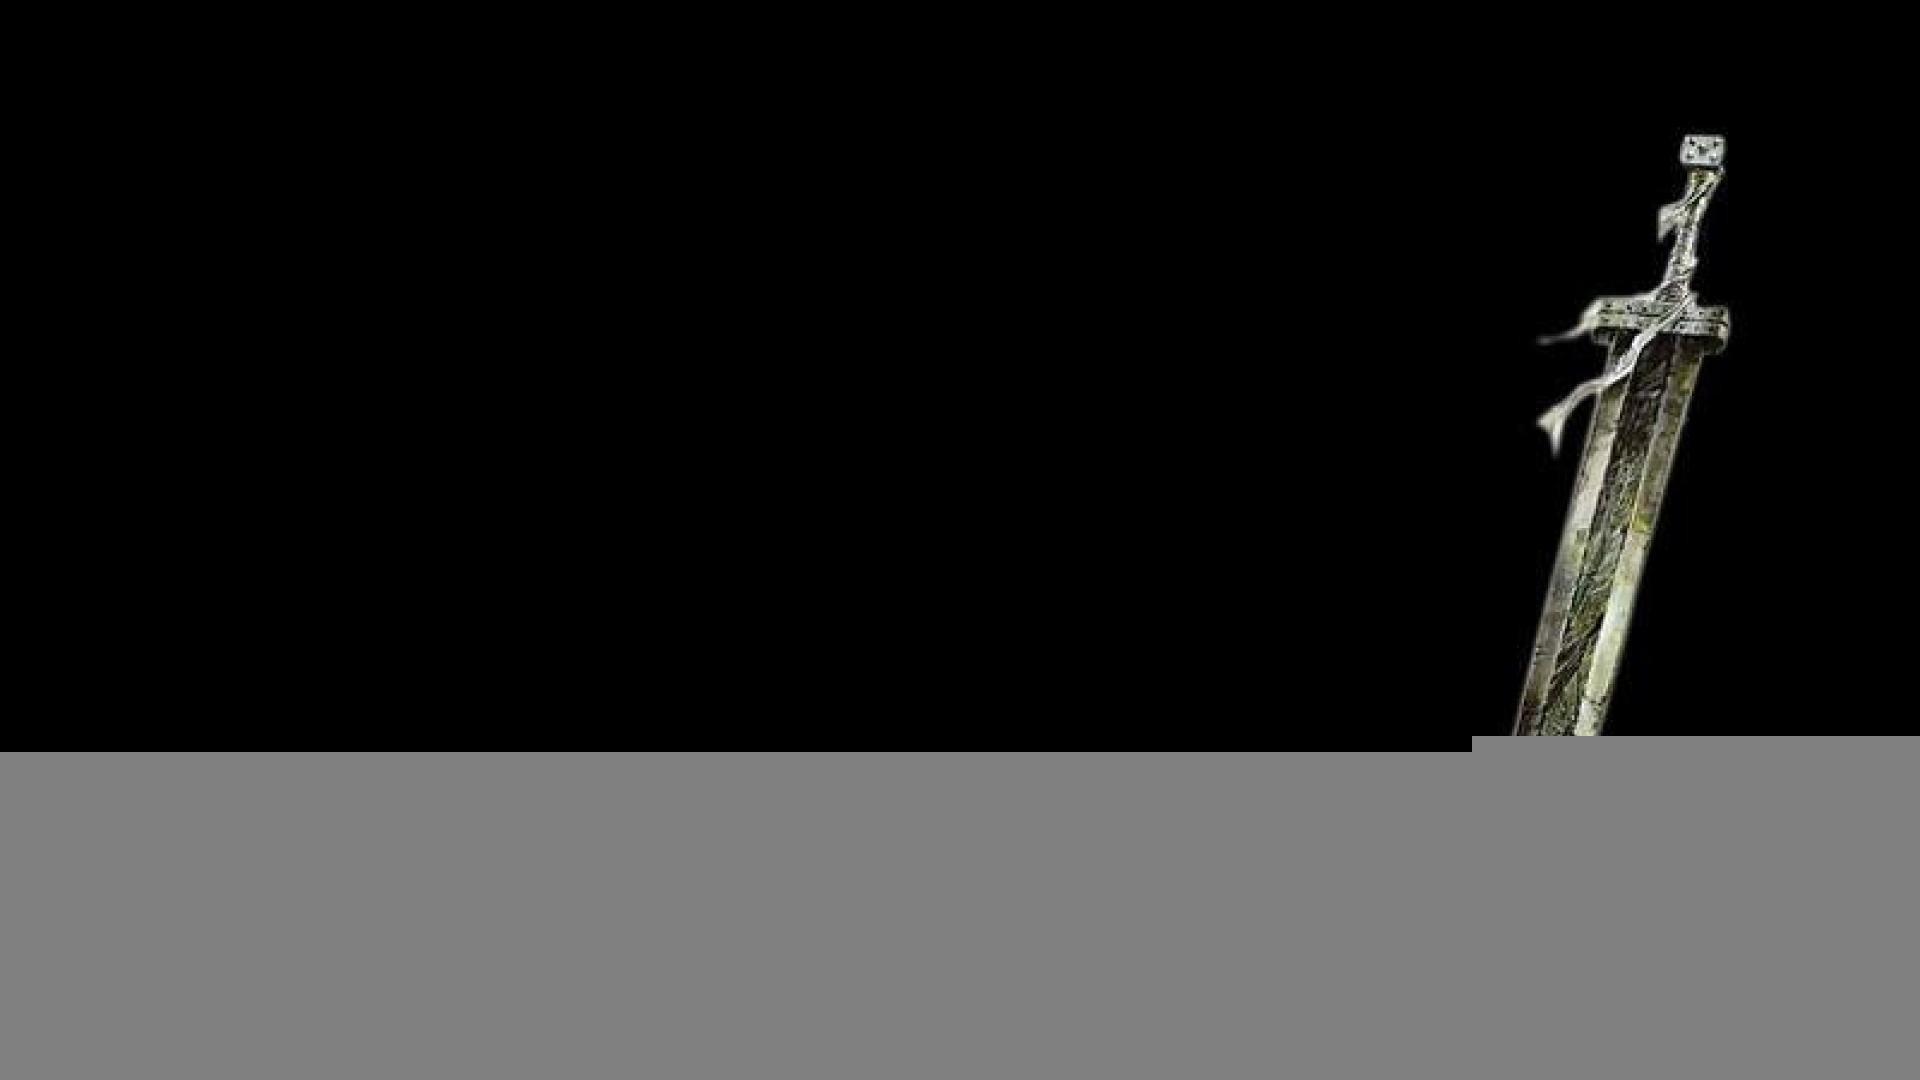 Sword, Berserk, Wide, Hd, Wallpaper, High, Resolution, Images, For, Desktop, Background, Download Wallpaper, Artwork, Amazing Wallpapers, 1920×1080 ... 1920x1080